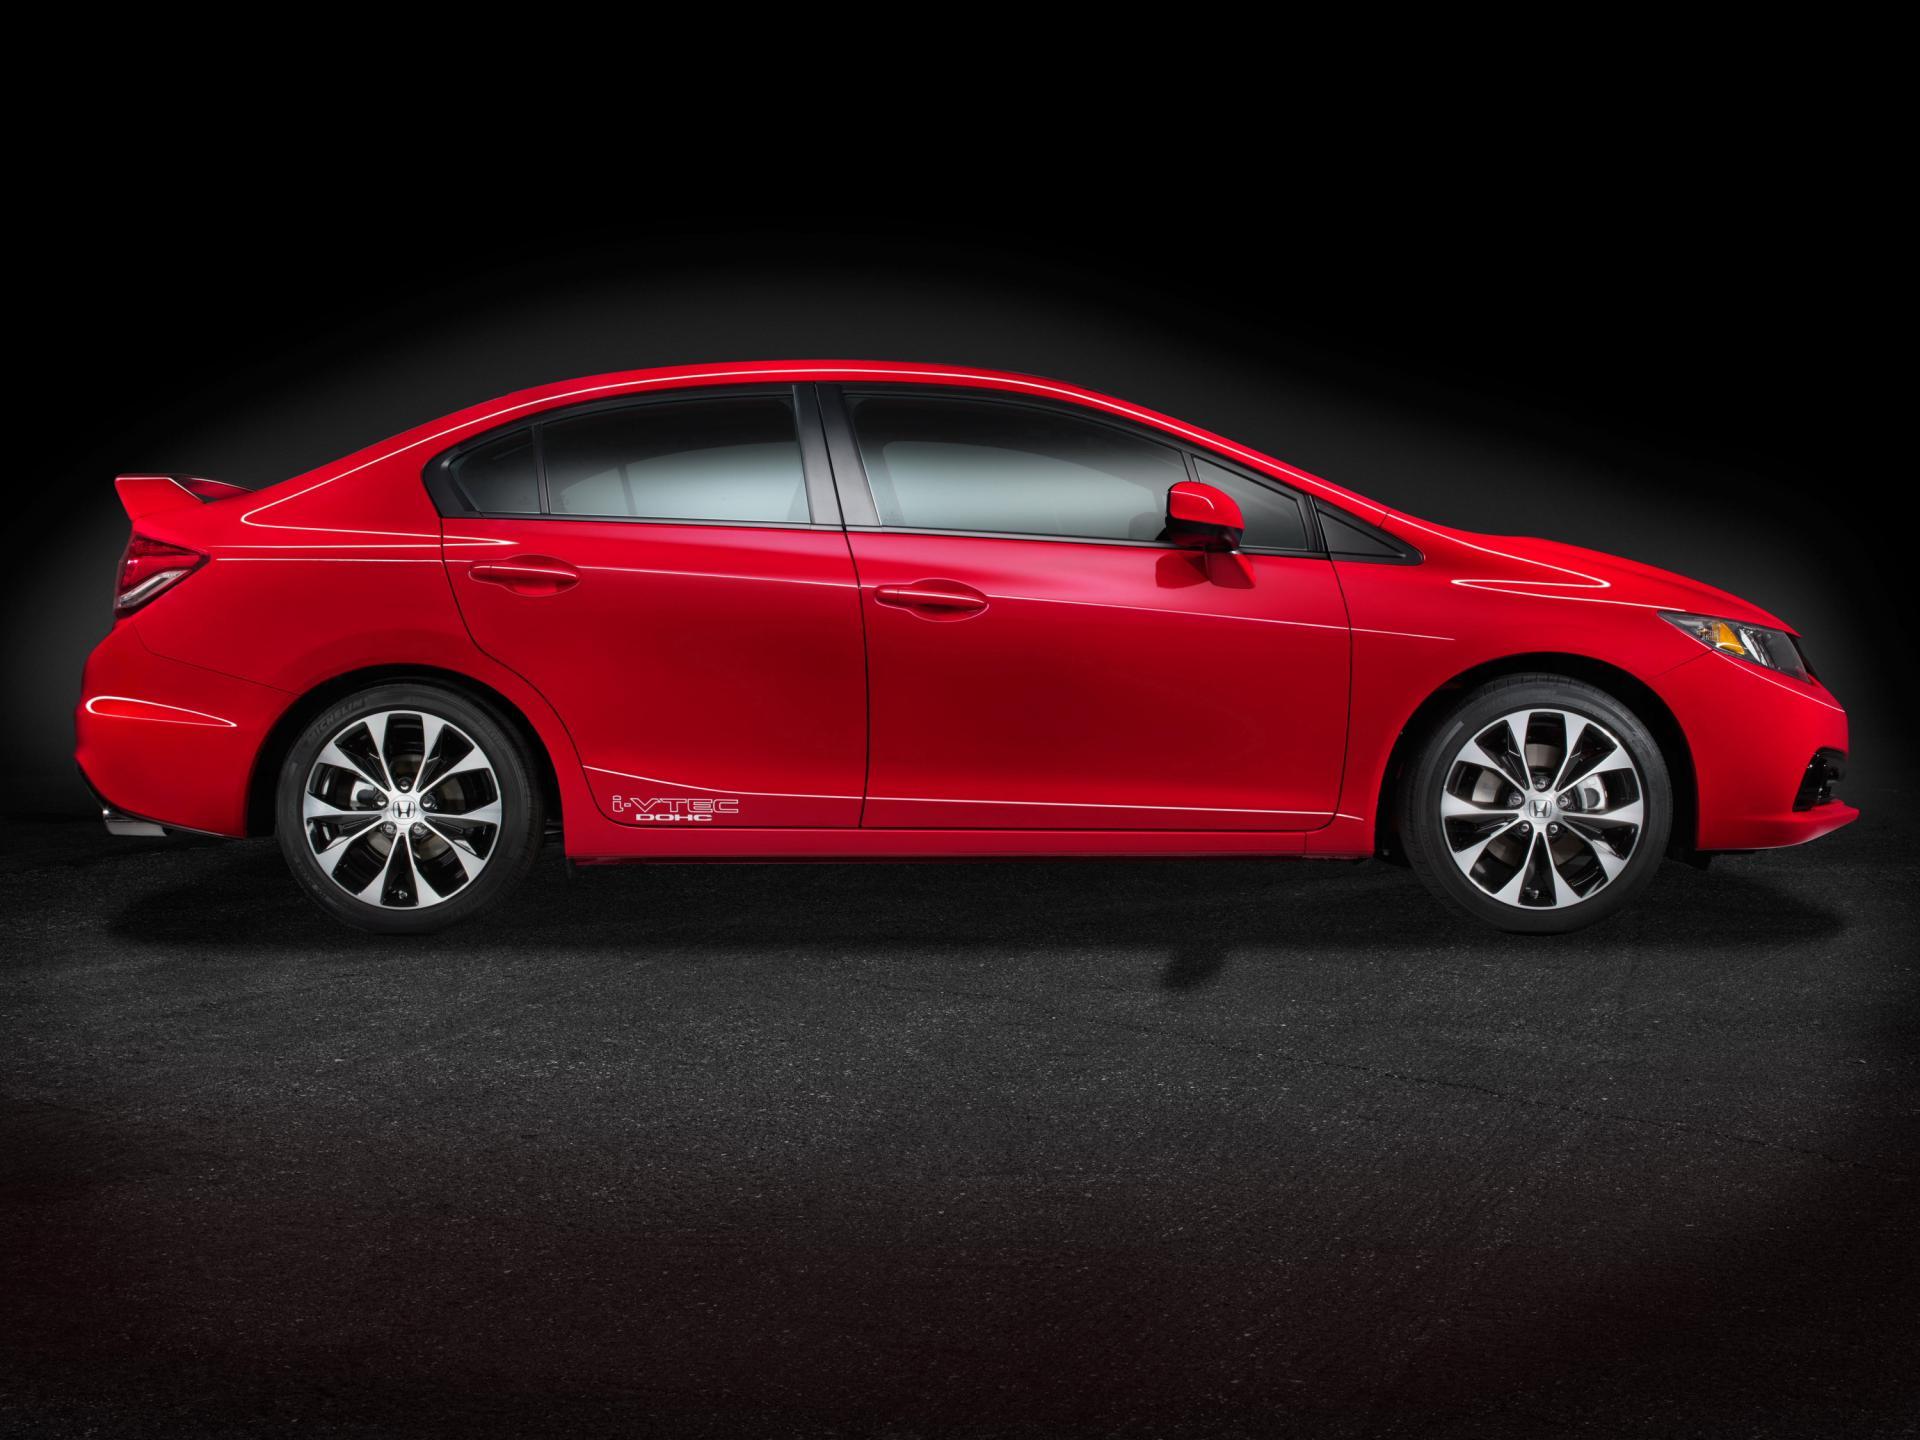 2013 Honda Civic Si Wallpaper And Image Gallery Com